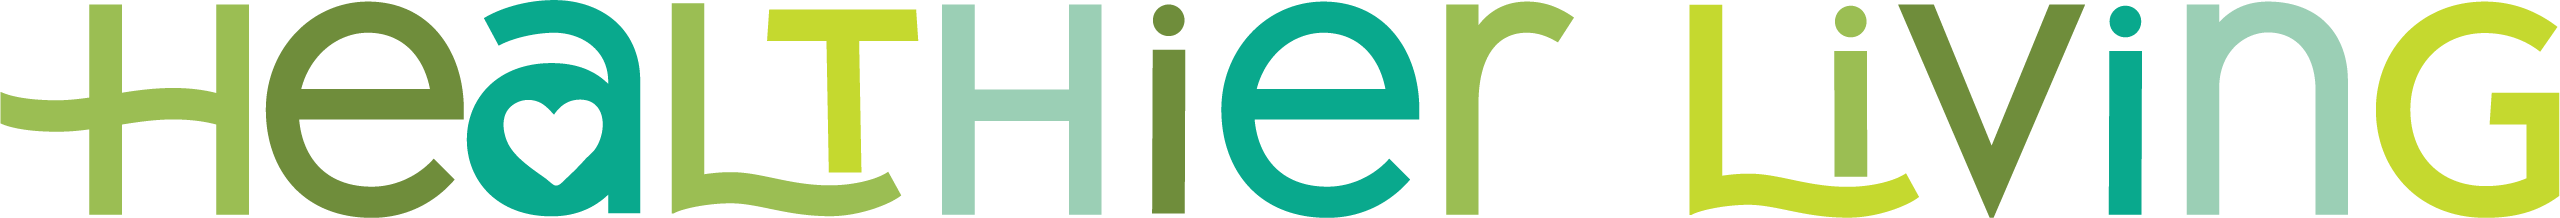 HealthierLiving.logo.h